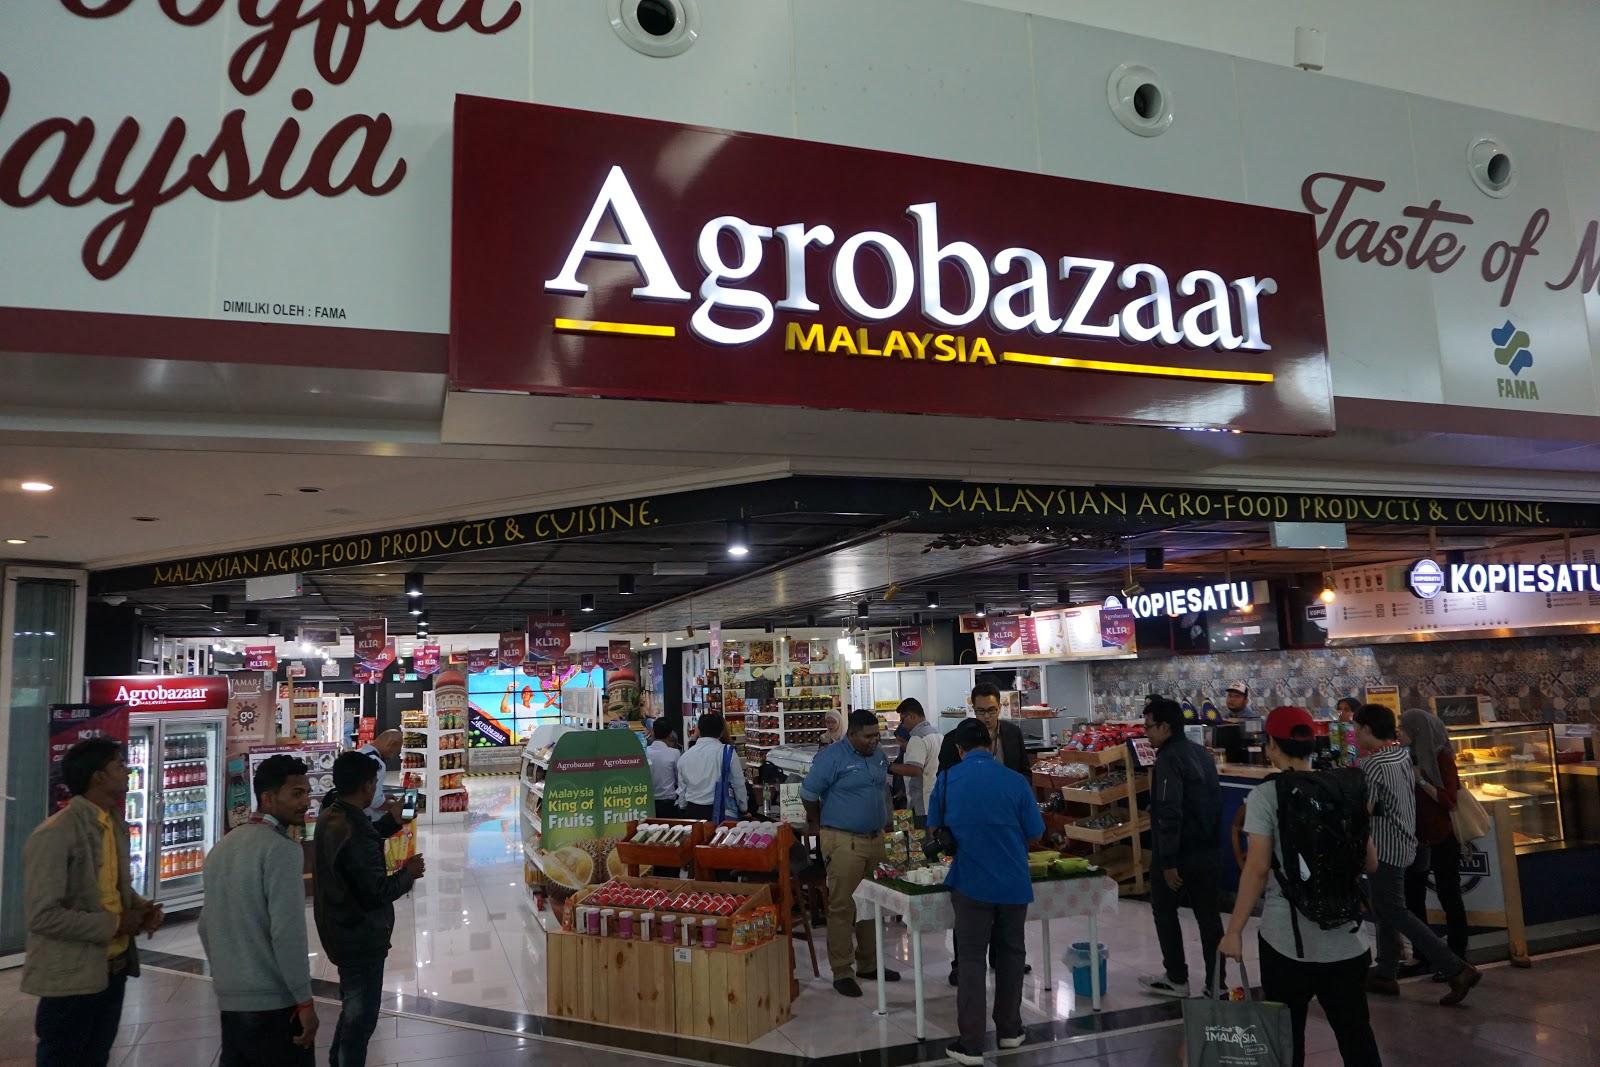 AGROBAZAAR MALAYSIA KLIA2